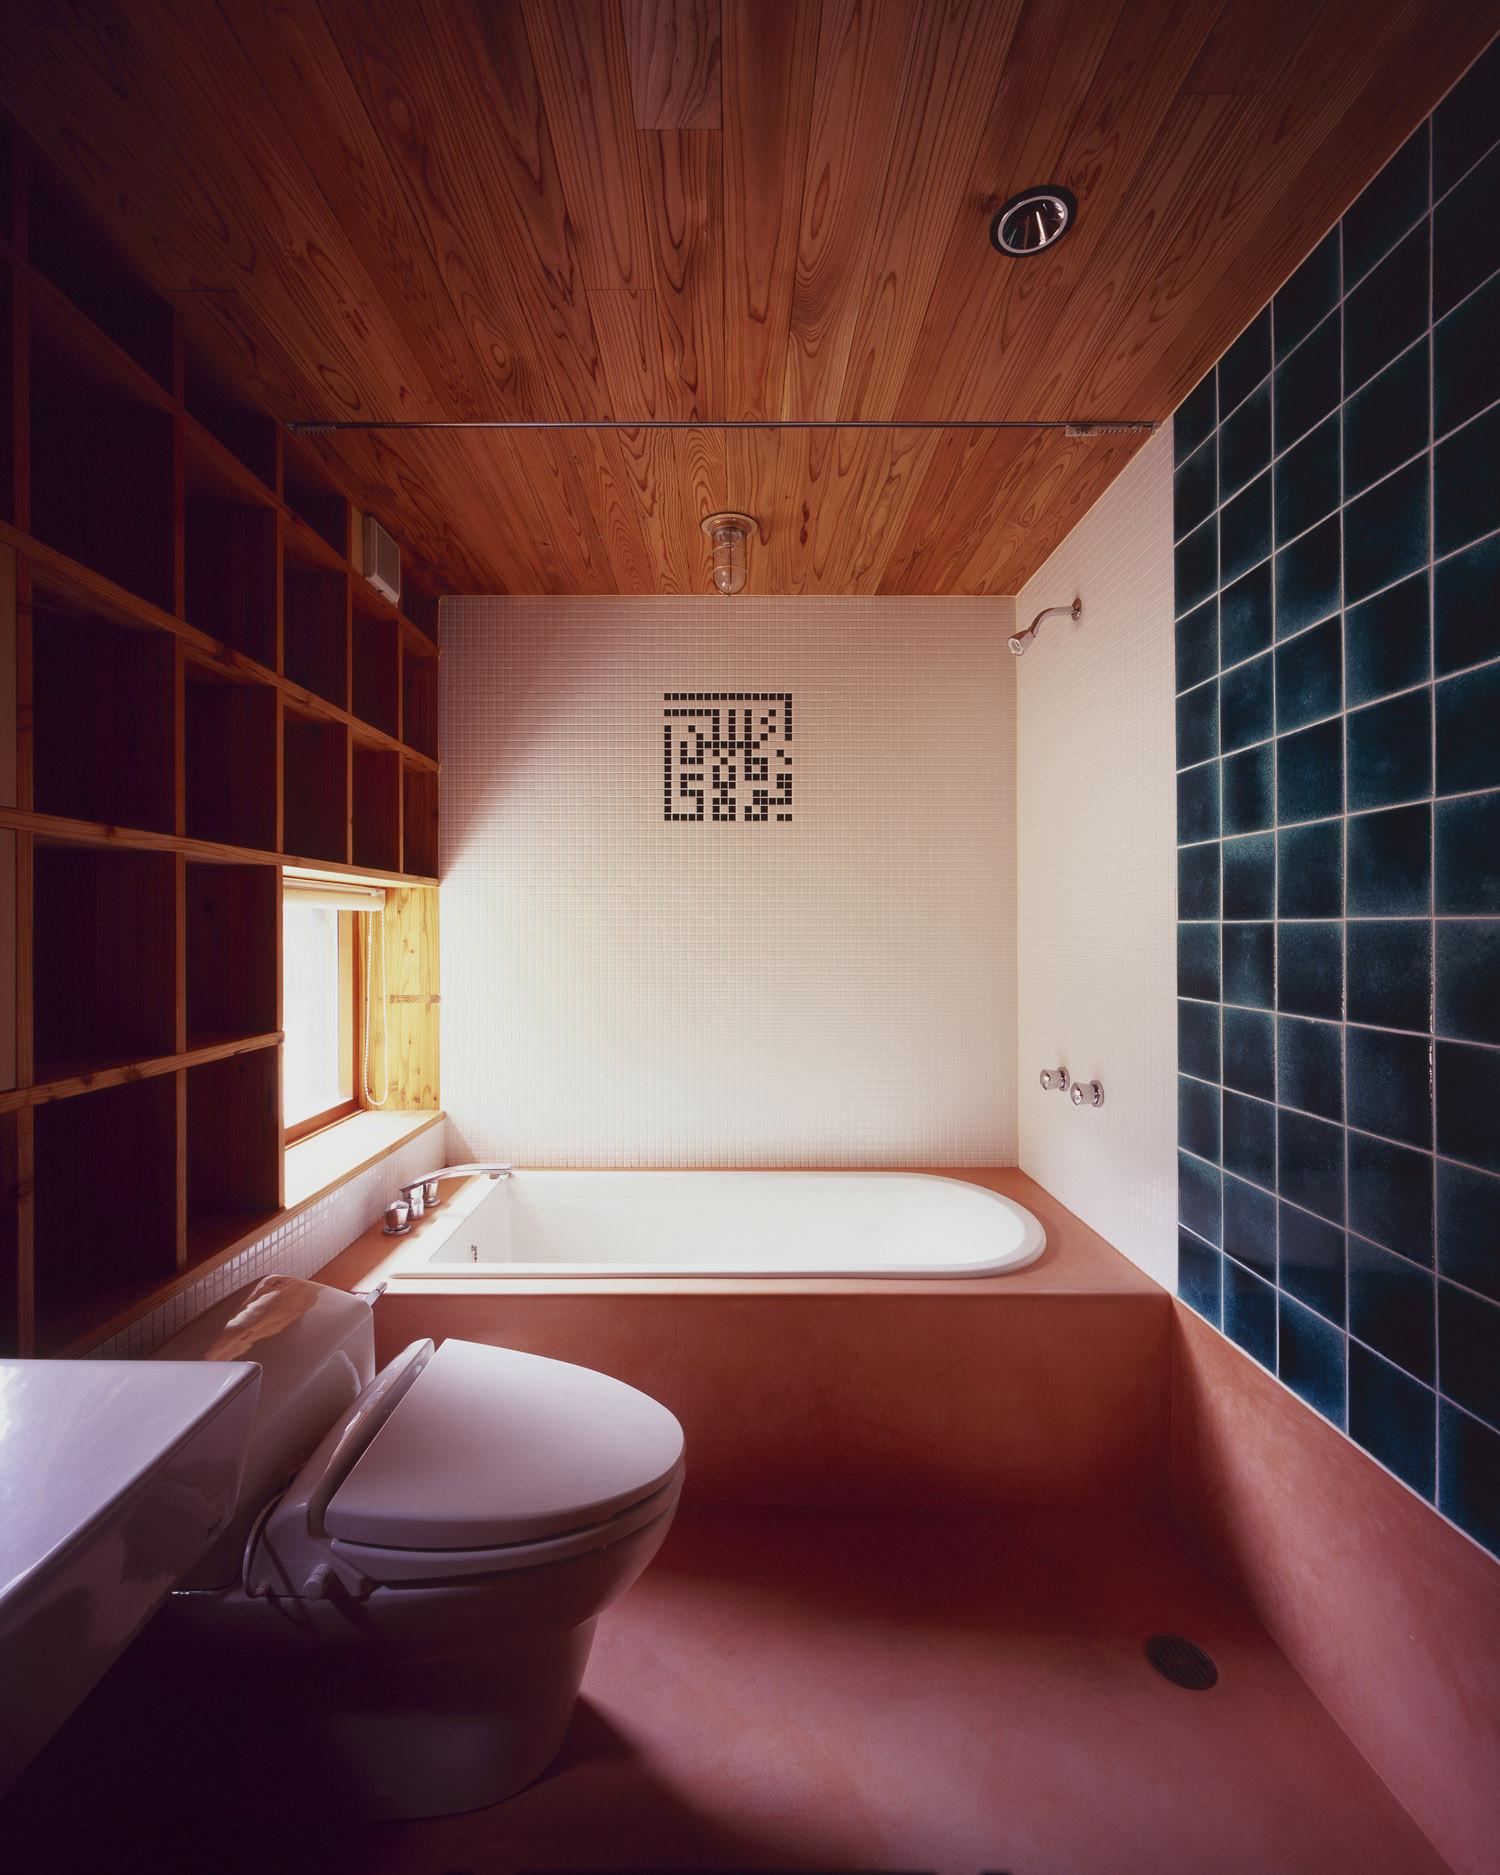 Gallery of shelf pod kazuya morita architecture studio 9 for Bathroom e pod mara